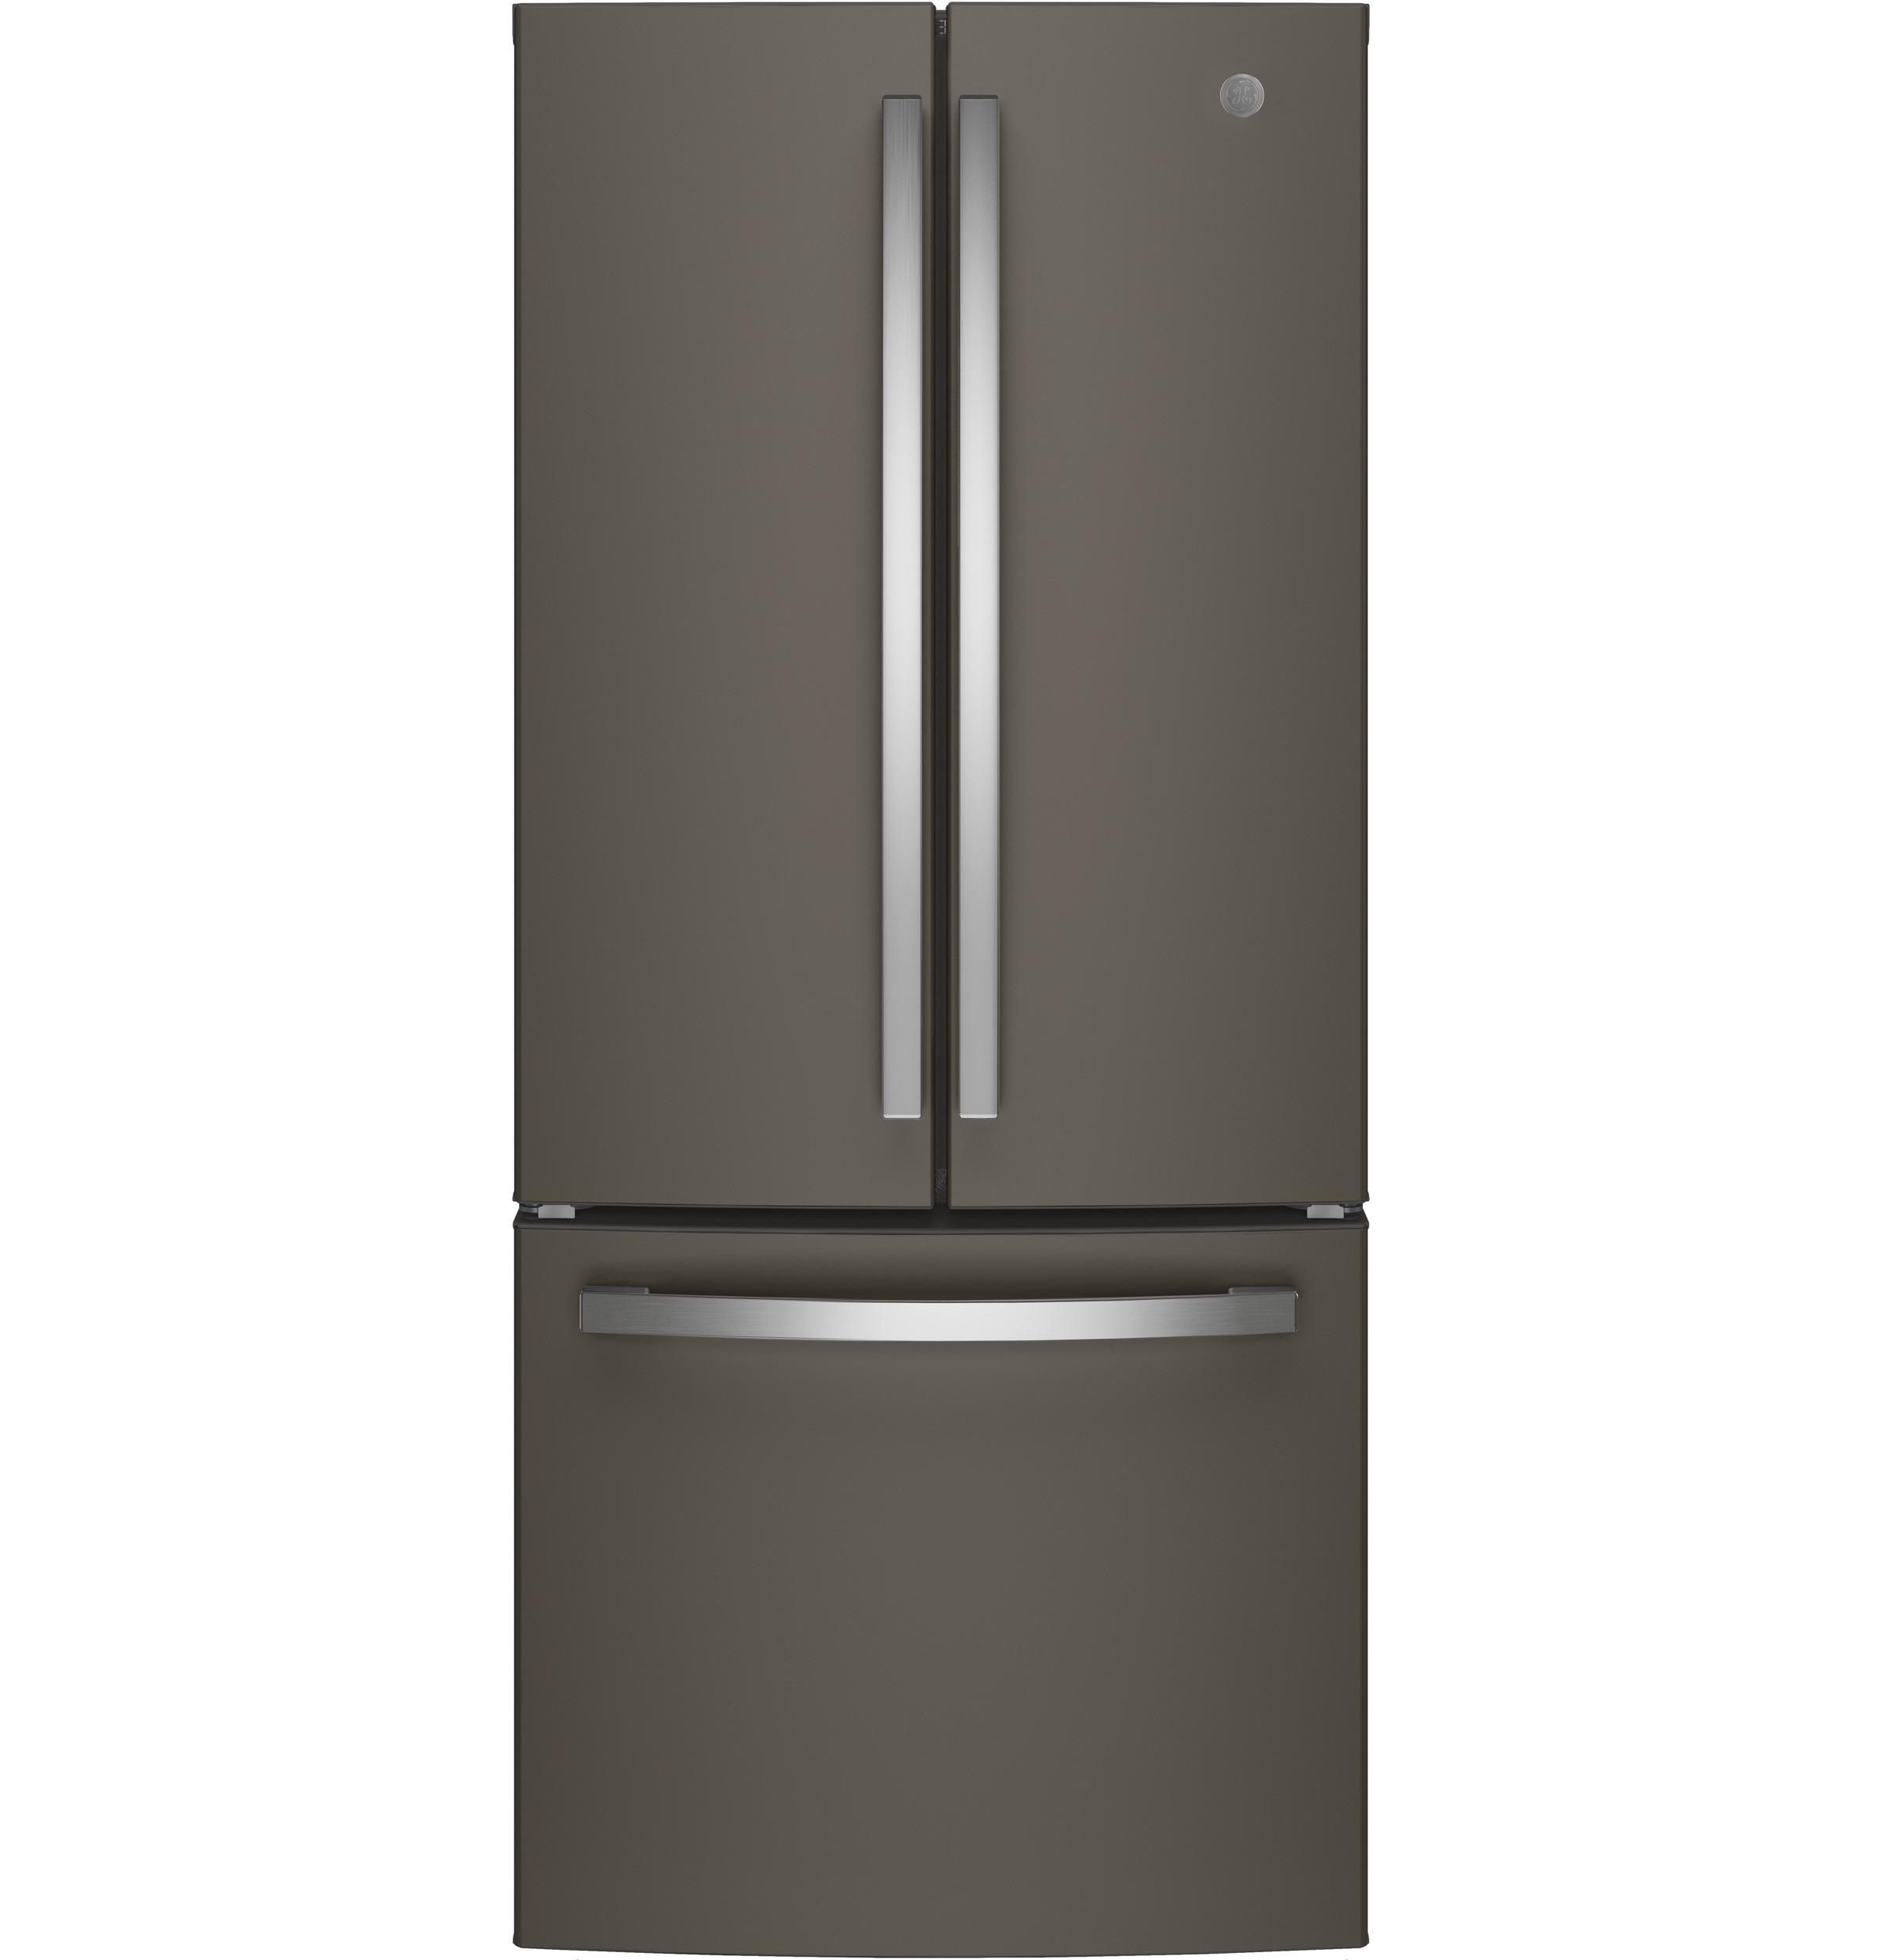 GE GE® ENERGY STAR® 20.8 Cu. Ft. French-Door Refrigerator